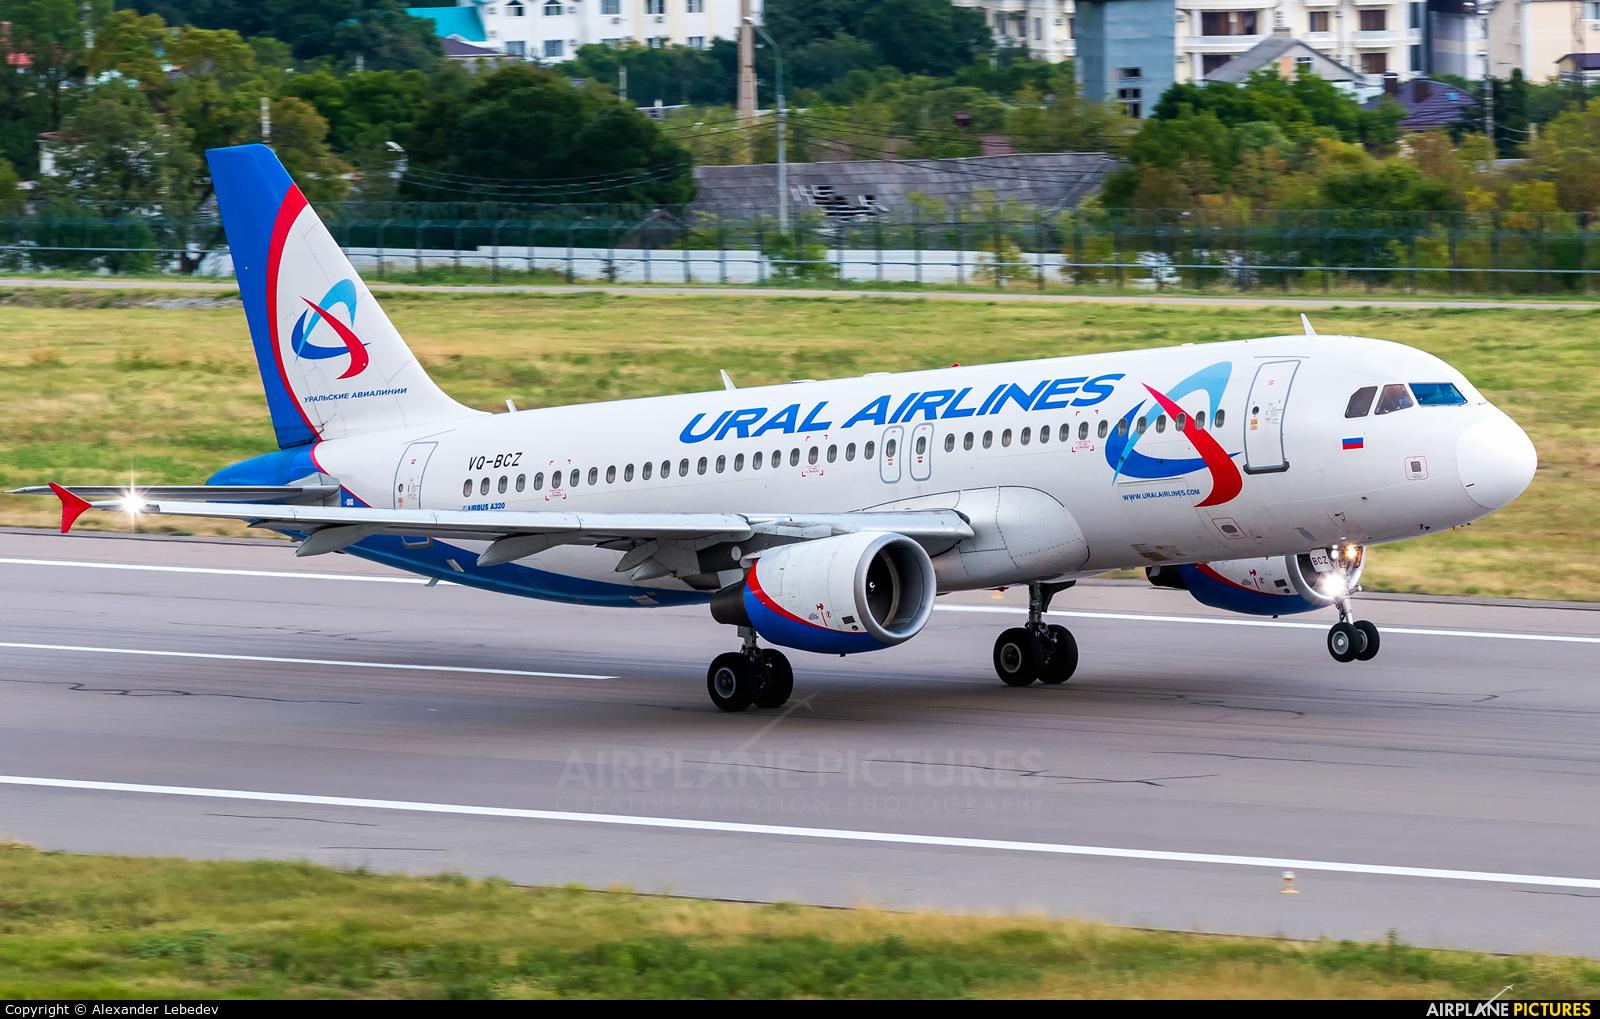 Ural Airlines VQ-BCZ aircraft at Gelendzhik